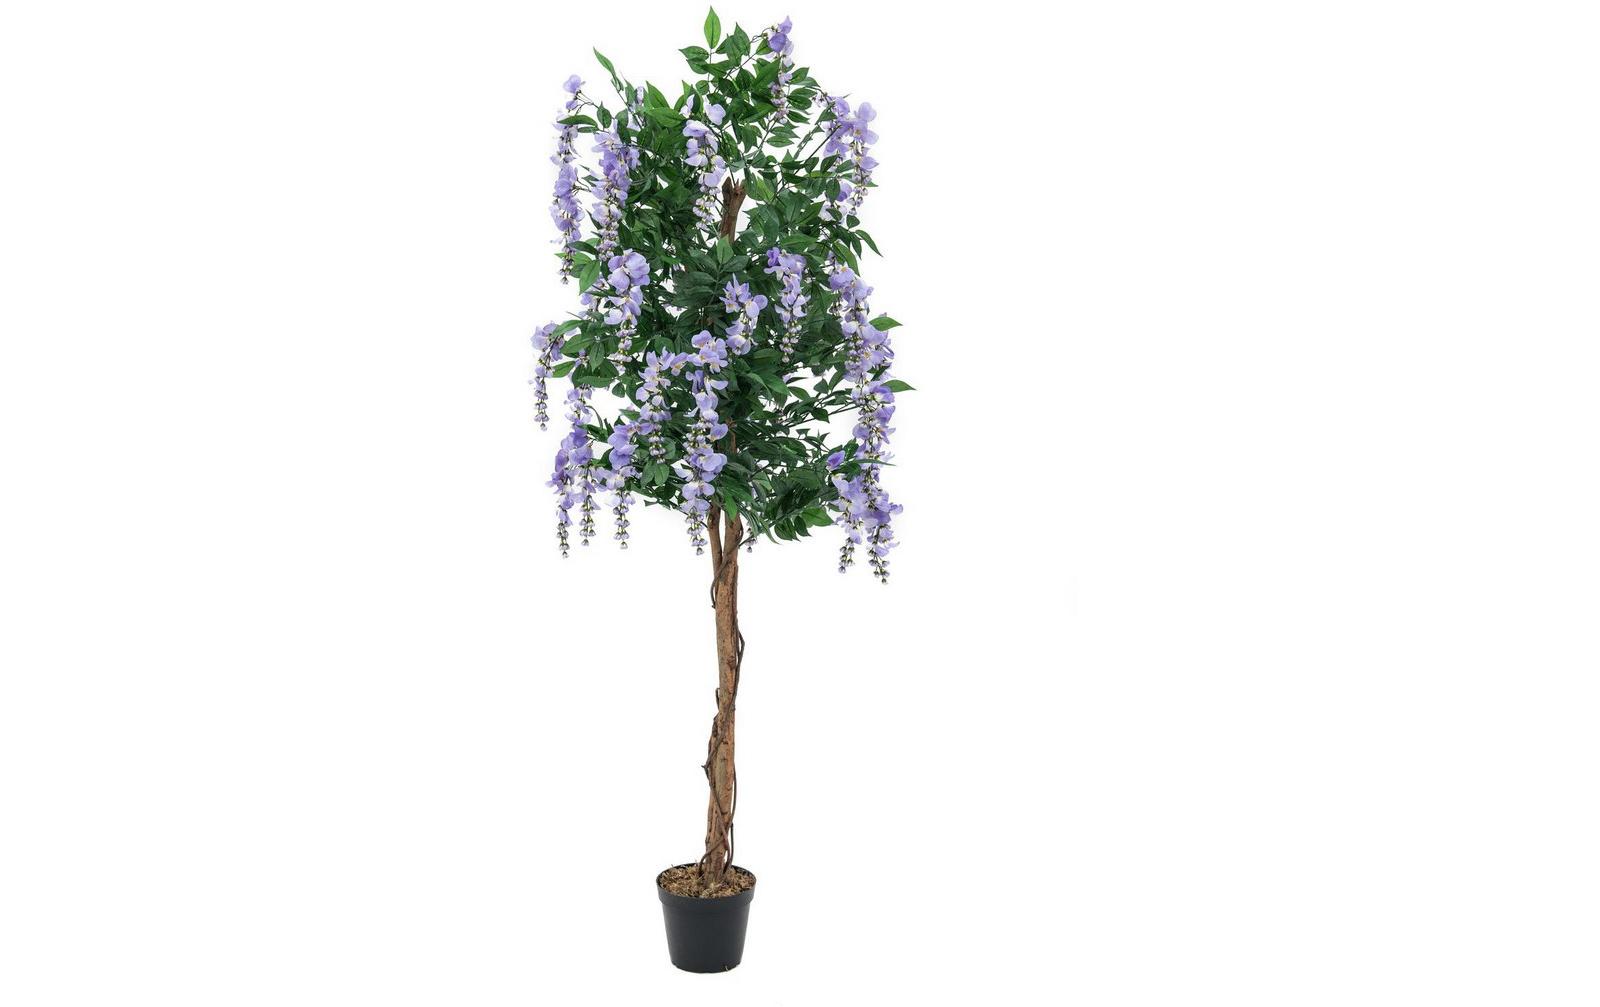 europalms-goldregenbaum-violett-kunststoffpflanze